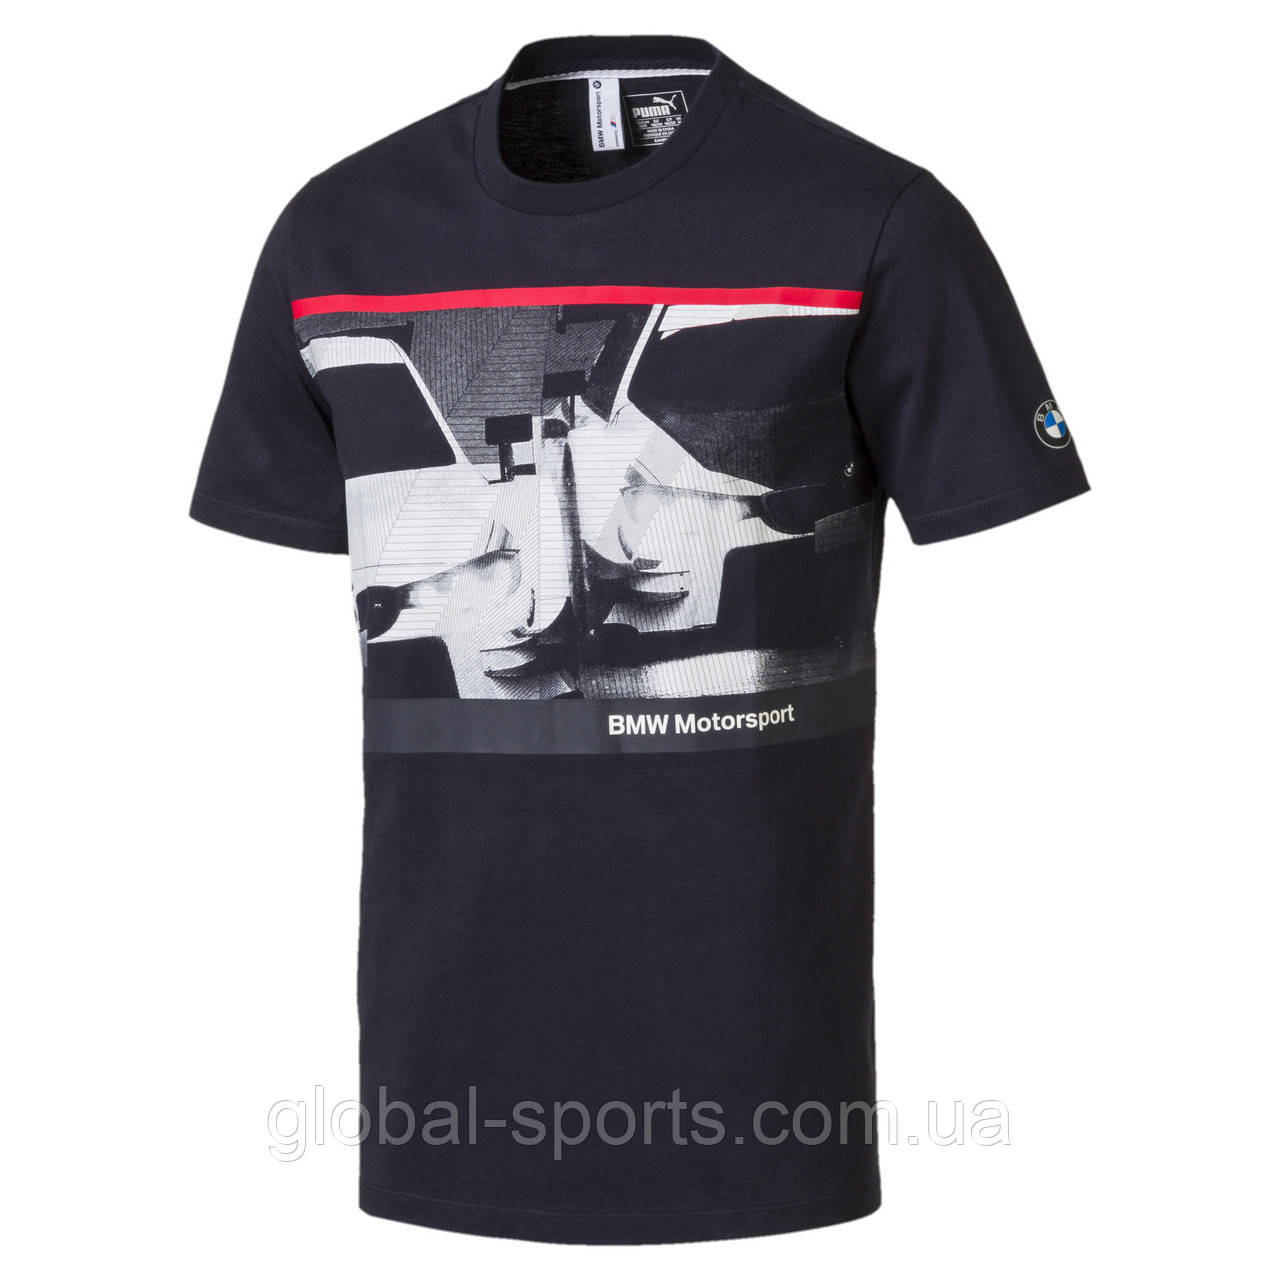 4614bb00e99c81 Футболка Puma BMW MS NightCat Tee (Артикул: 57526001): продажа, цена ...